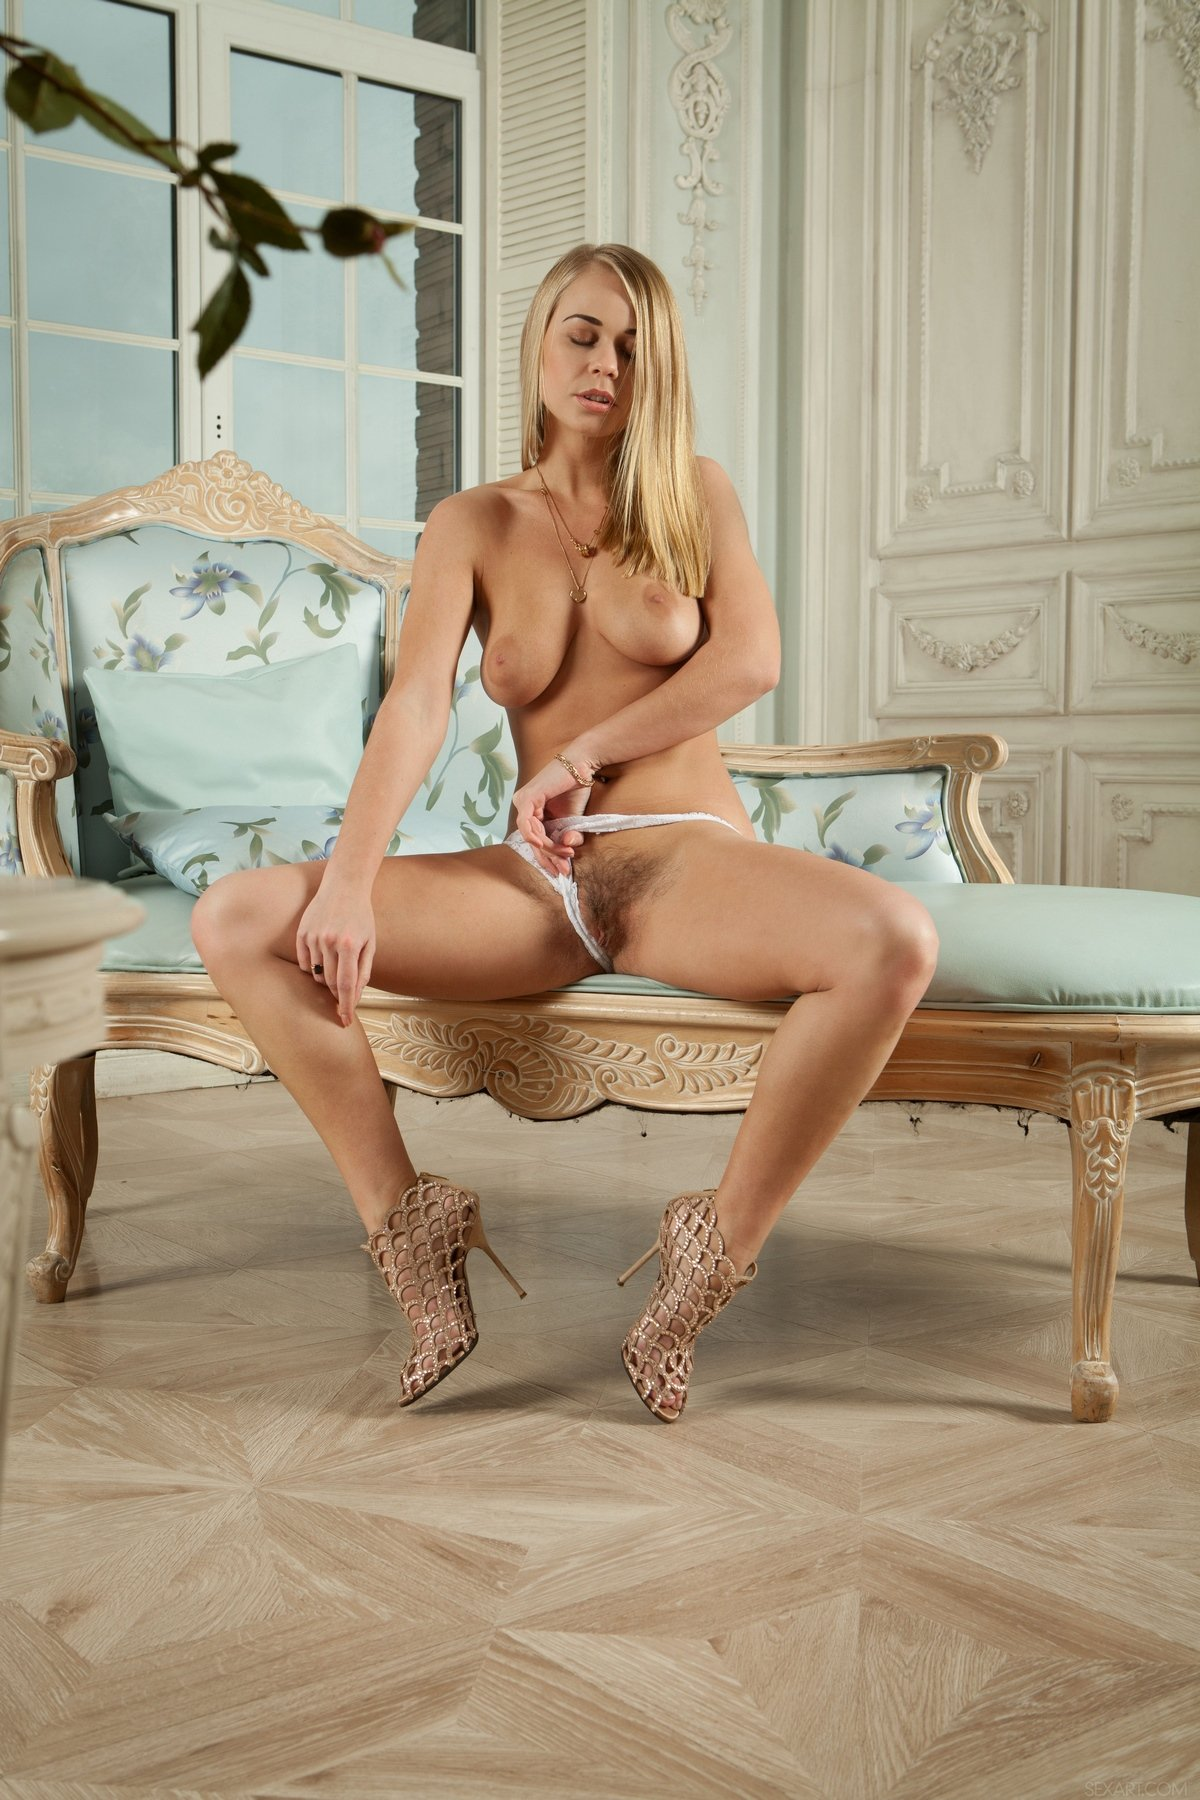 Красотка блондинка показала небритую киску